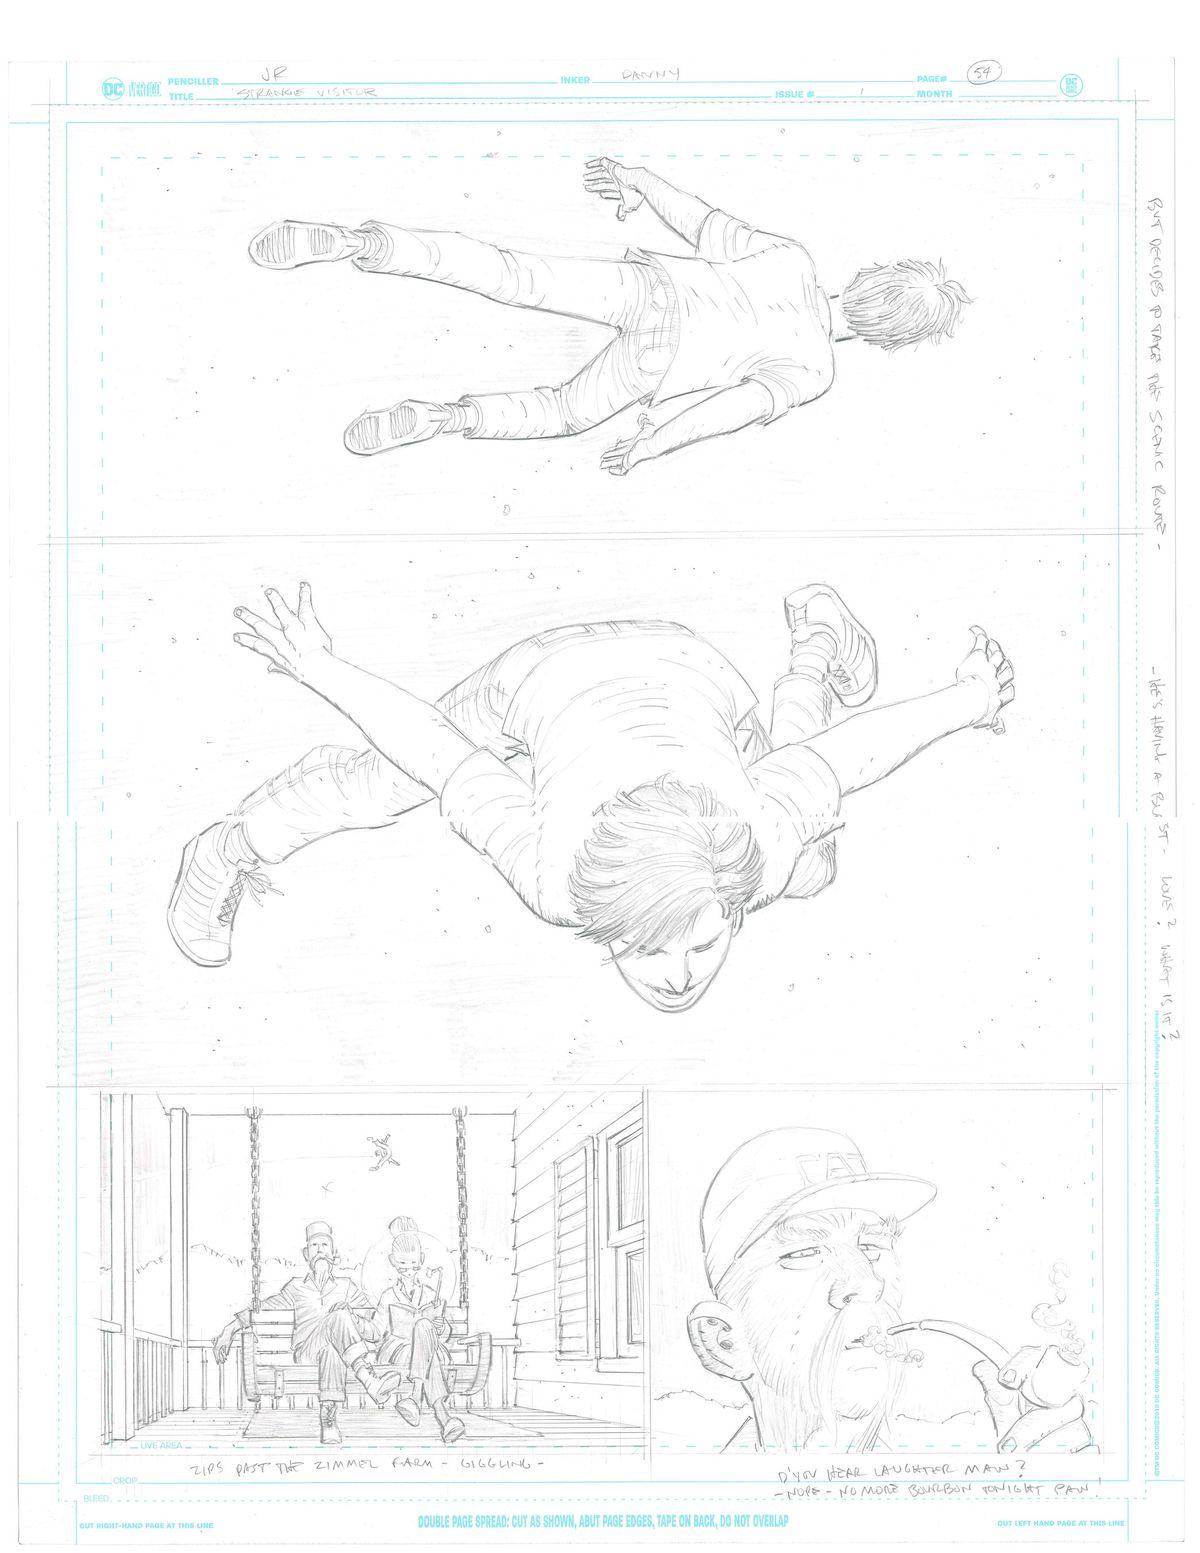 John Romita Jr.'s raw pencils of Clark Kent in Superman: Year One #1, DC Comics (2019).